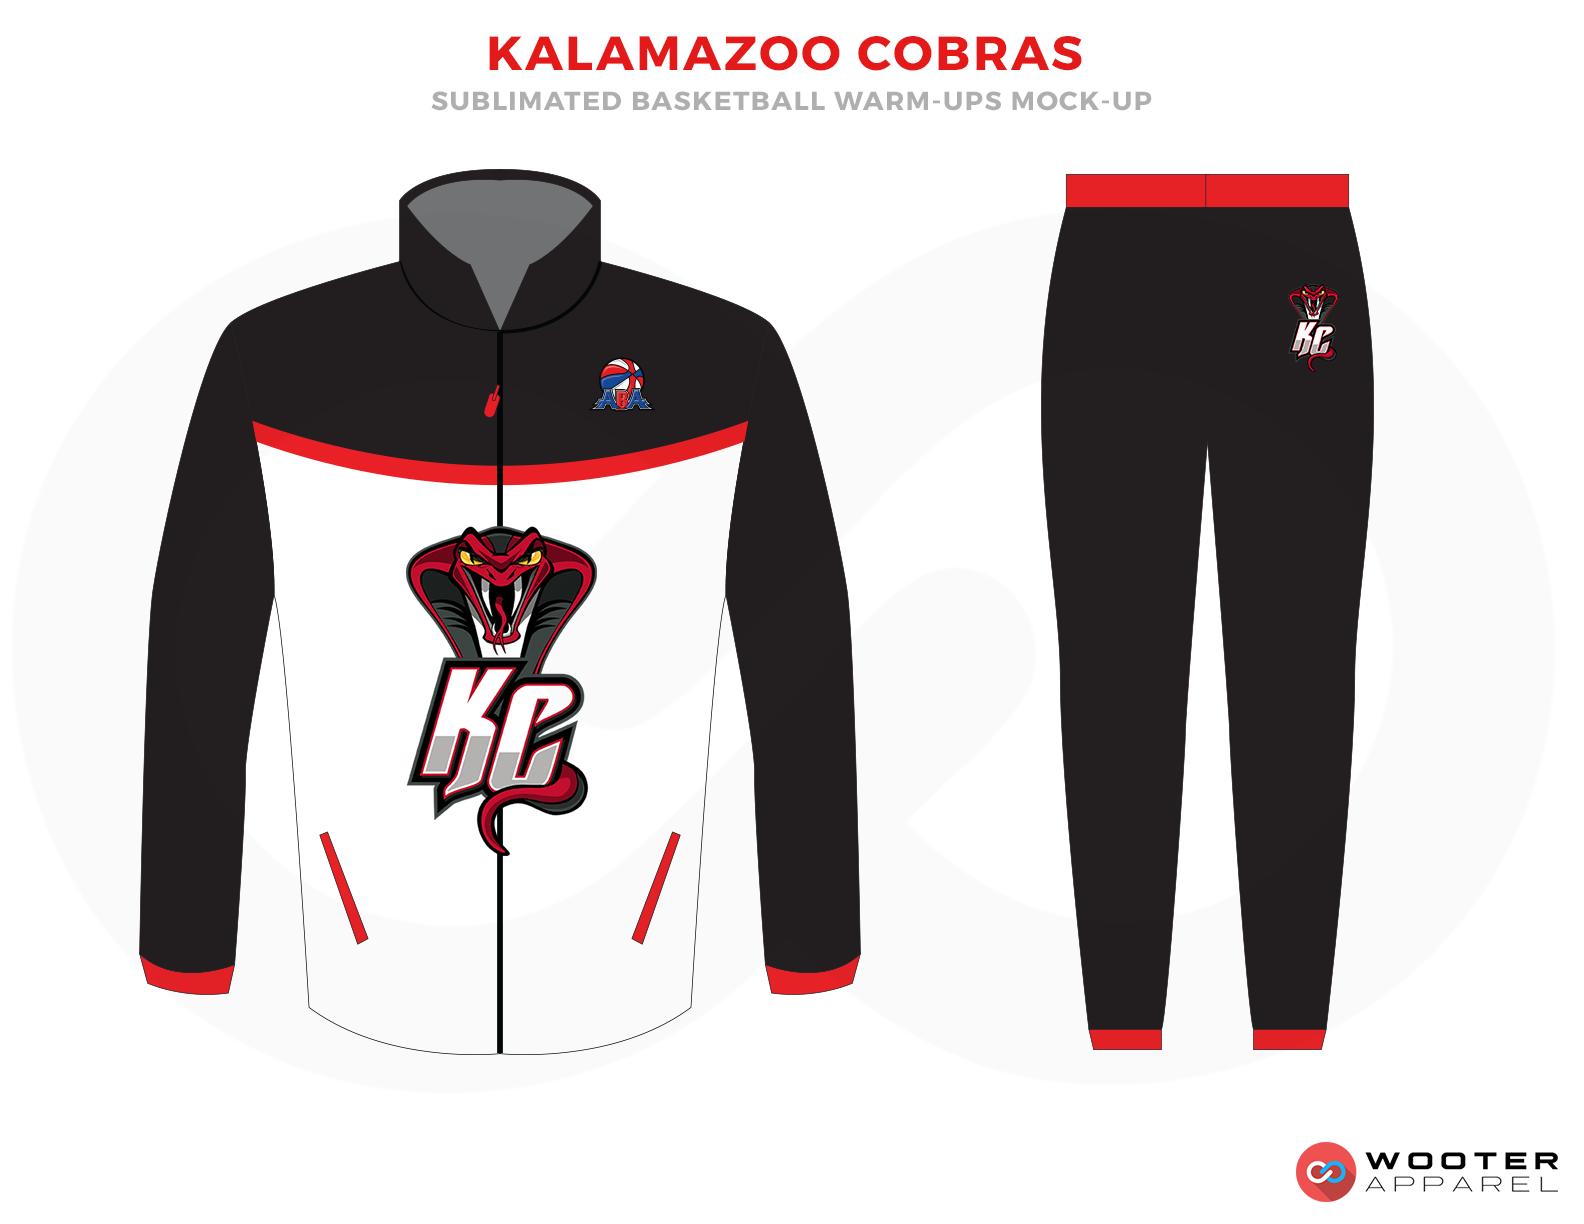 KALAMAZOO COBRAS White Black and Red Basketball Uniforms, Pants and Jackets